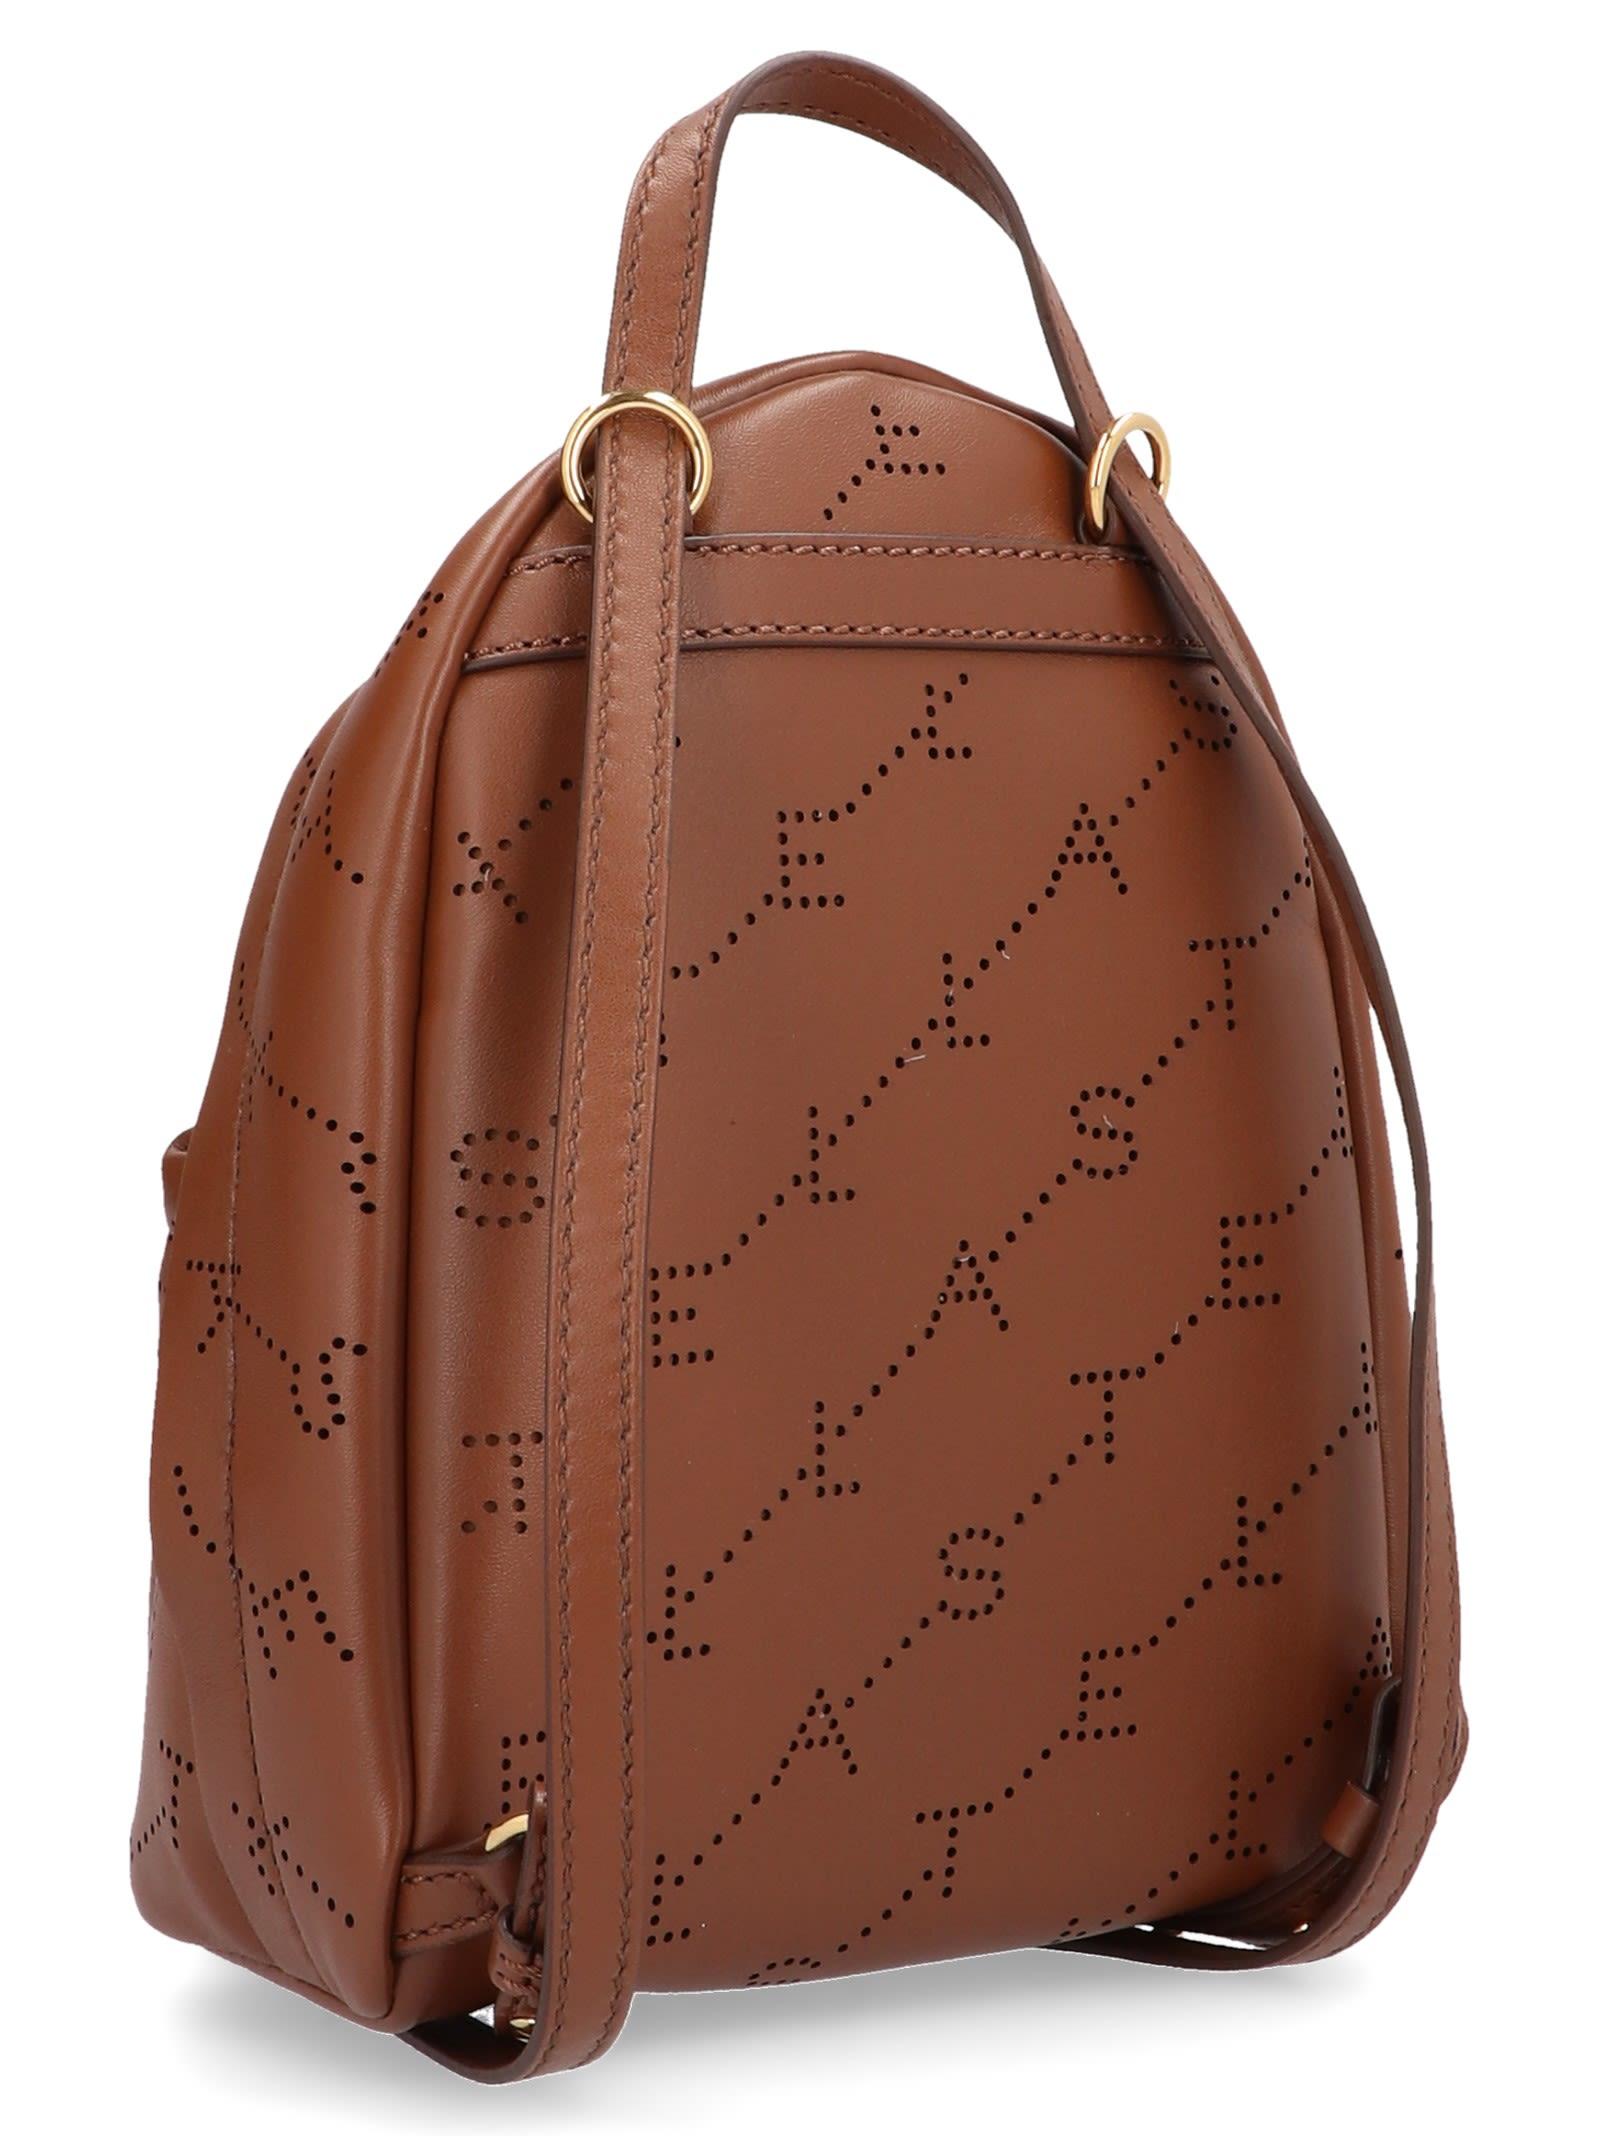 Stella McCartney Stella Mccartney  the Logo Bag  Bag - Brown ... 3144c1b4ba701